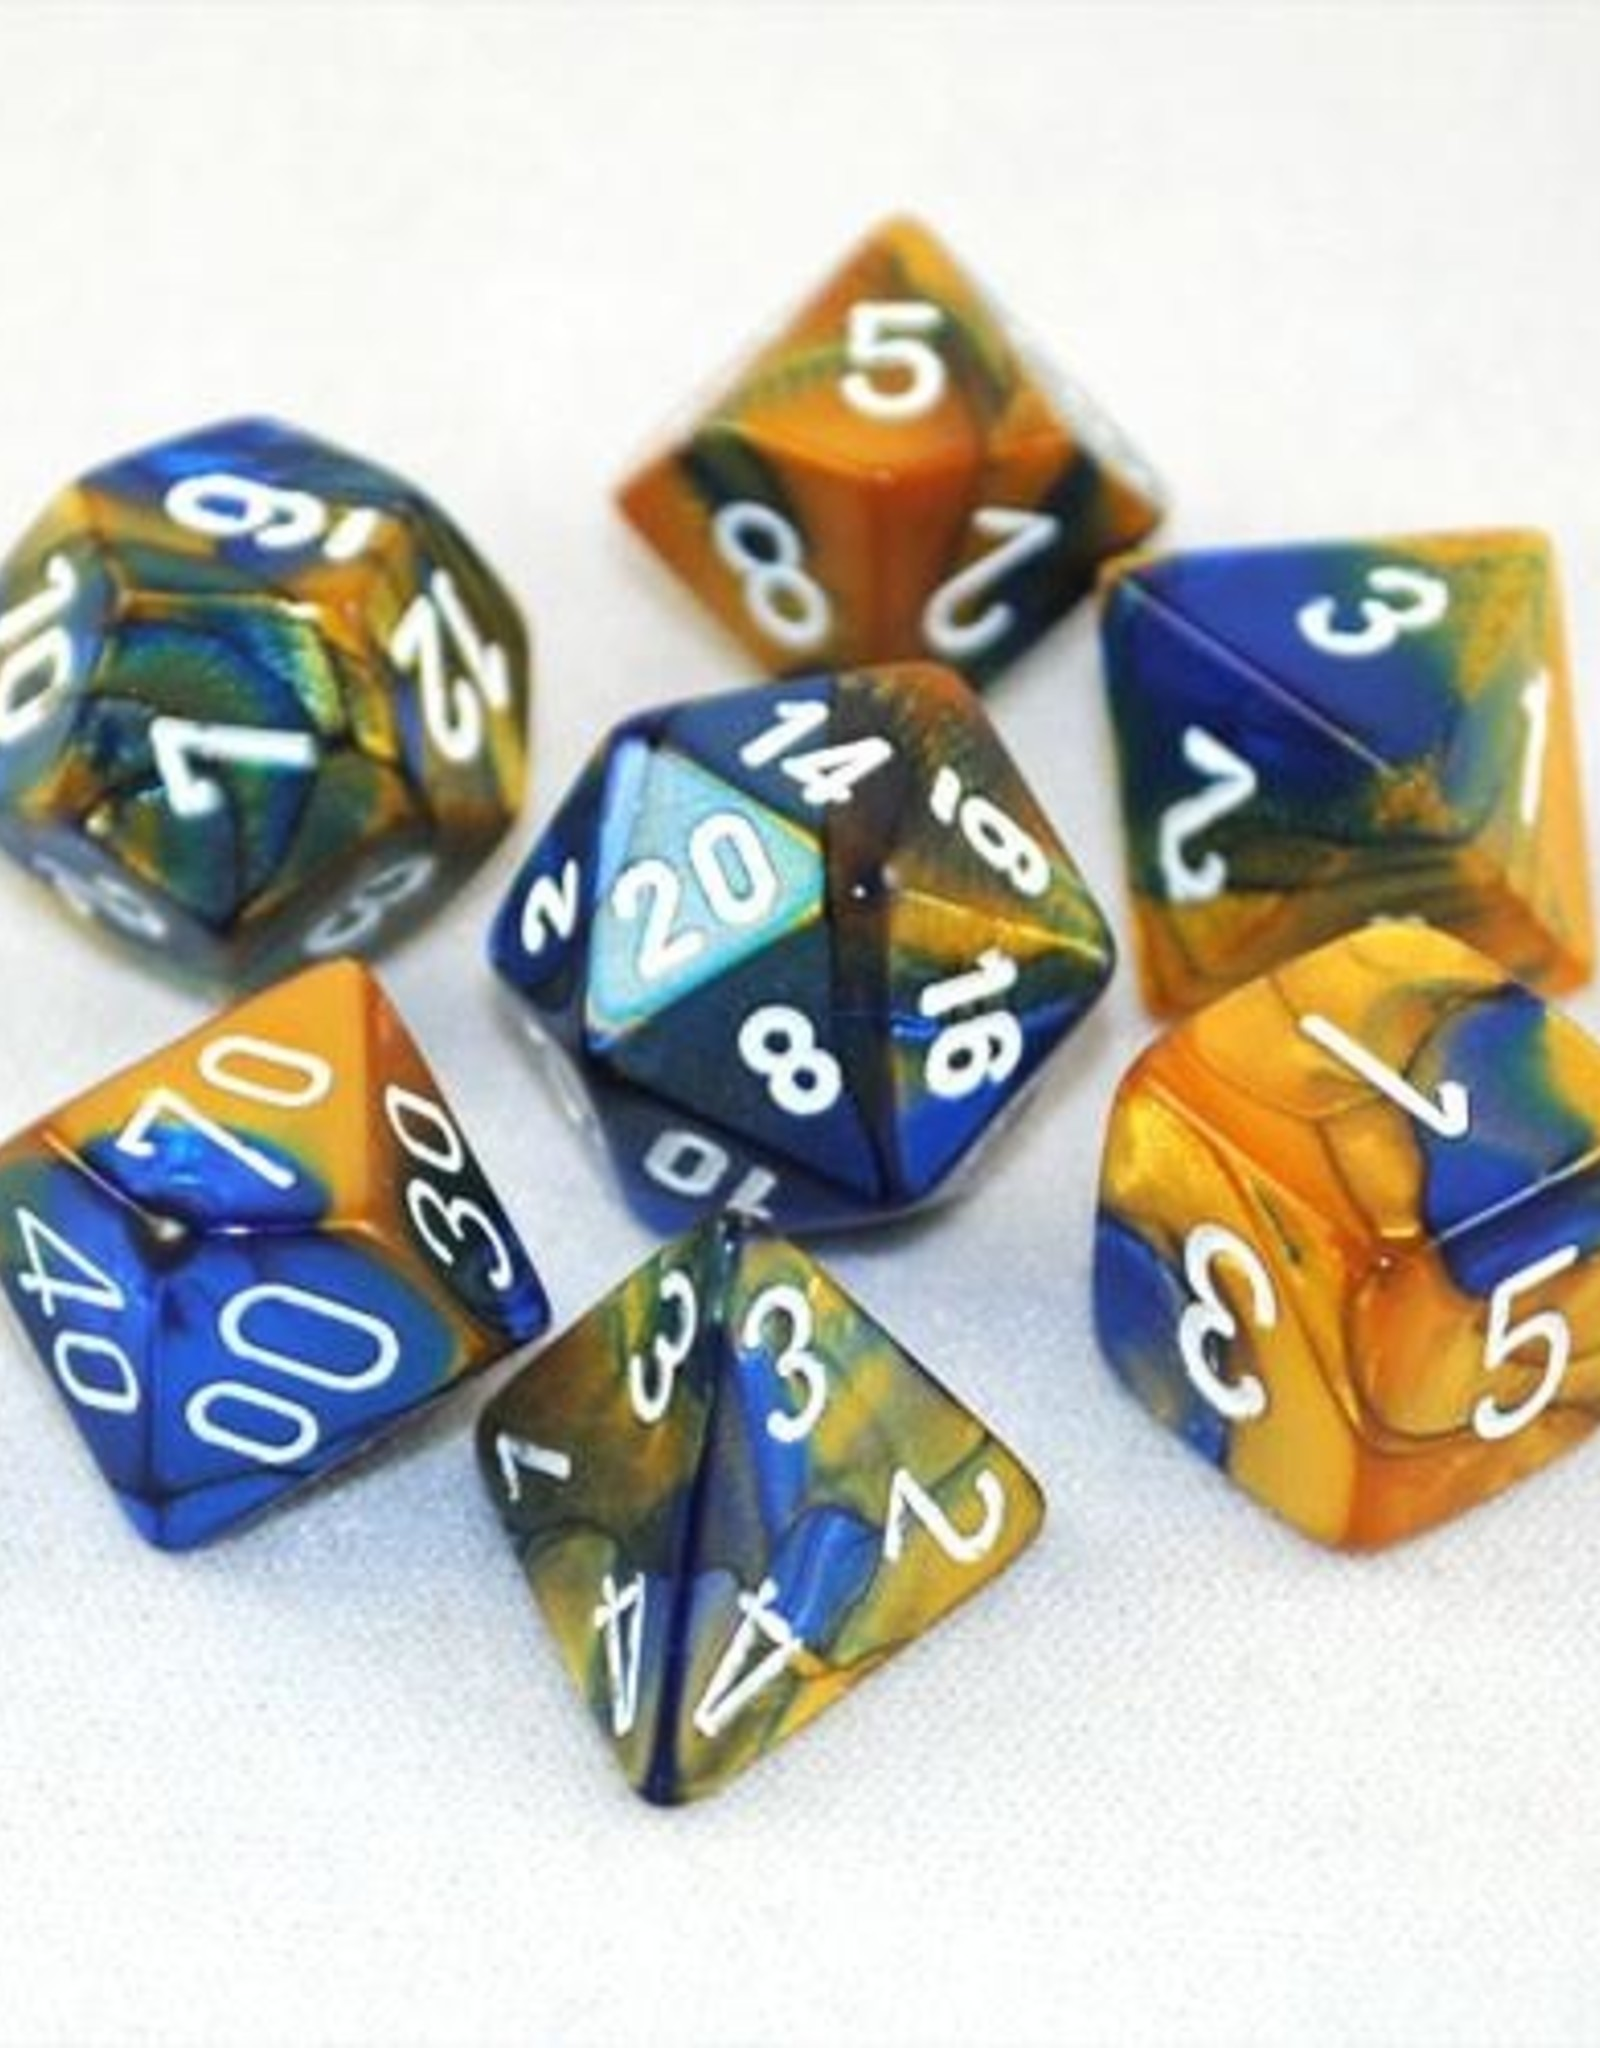 Chessex Chessex 7-Die set Gemini - Blue-Gold/White